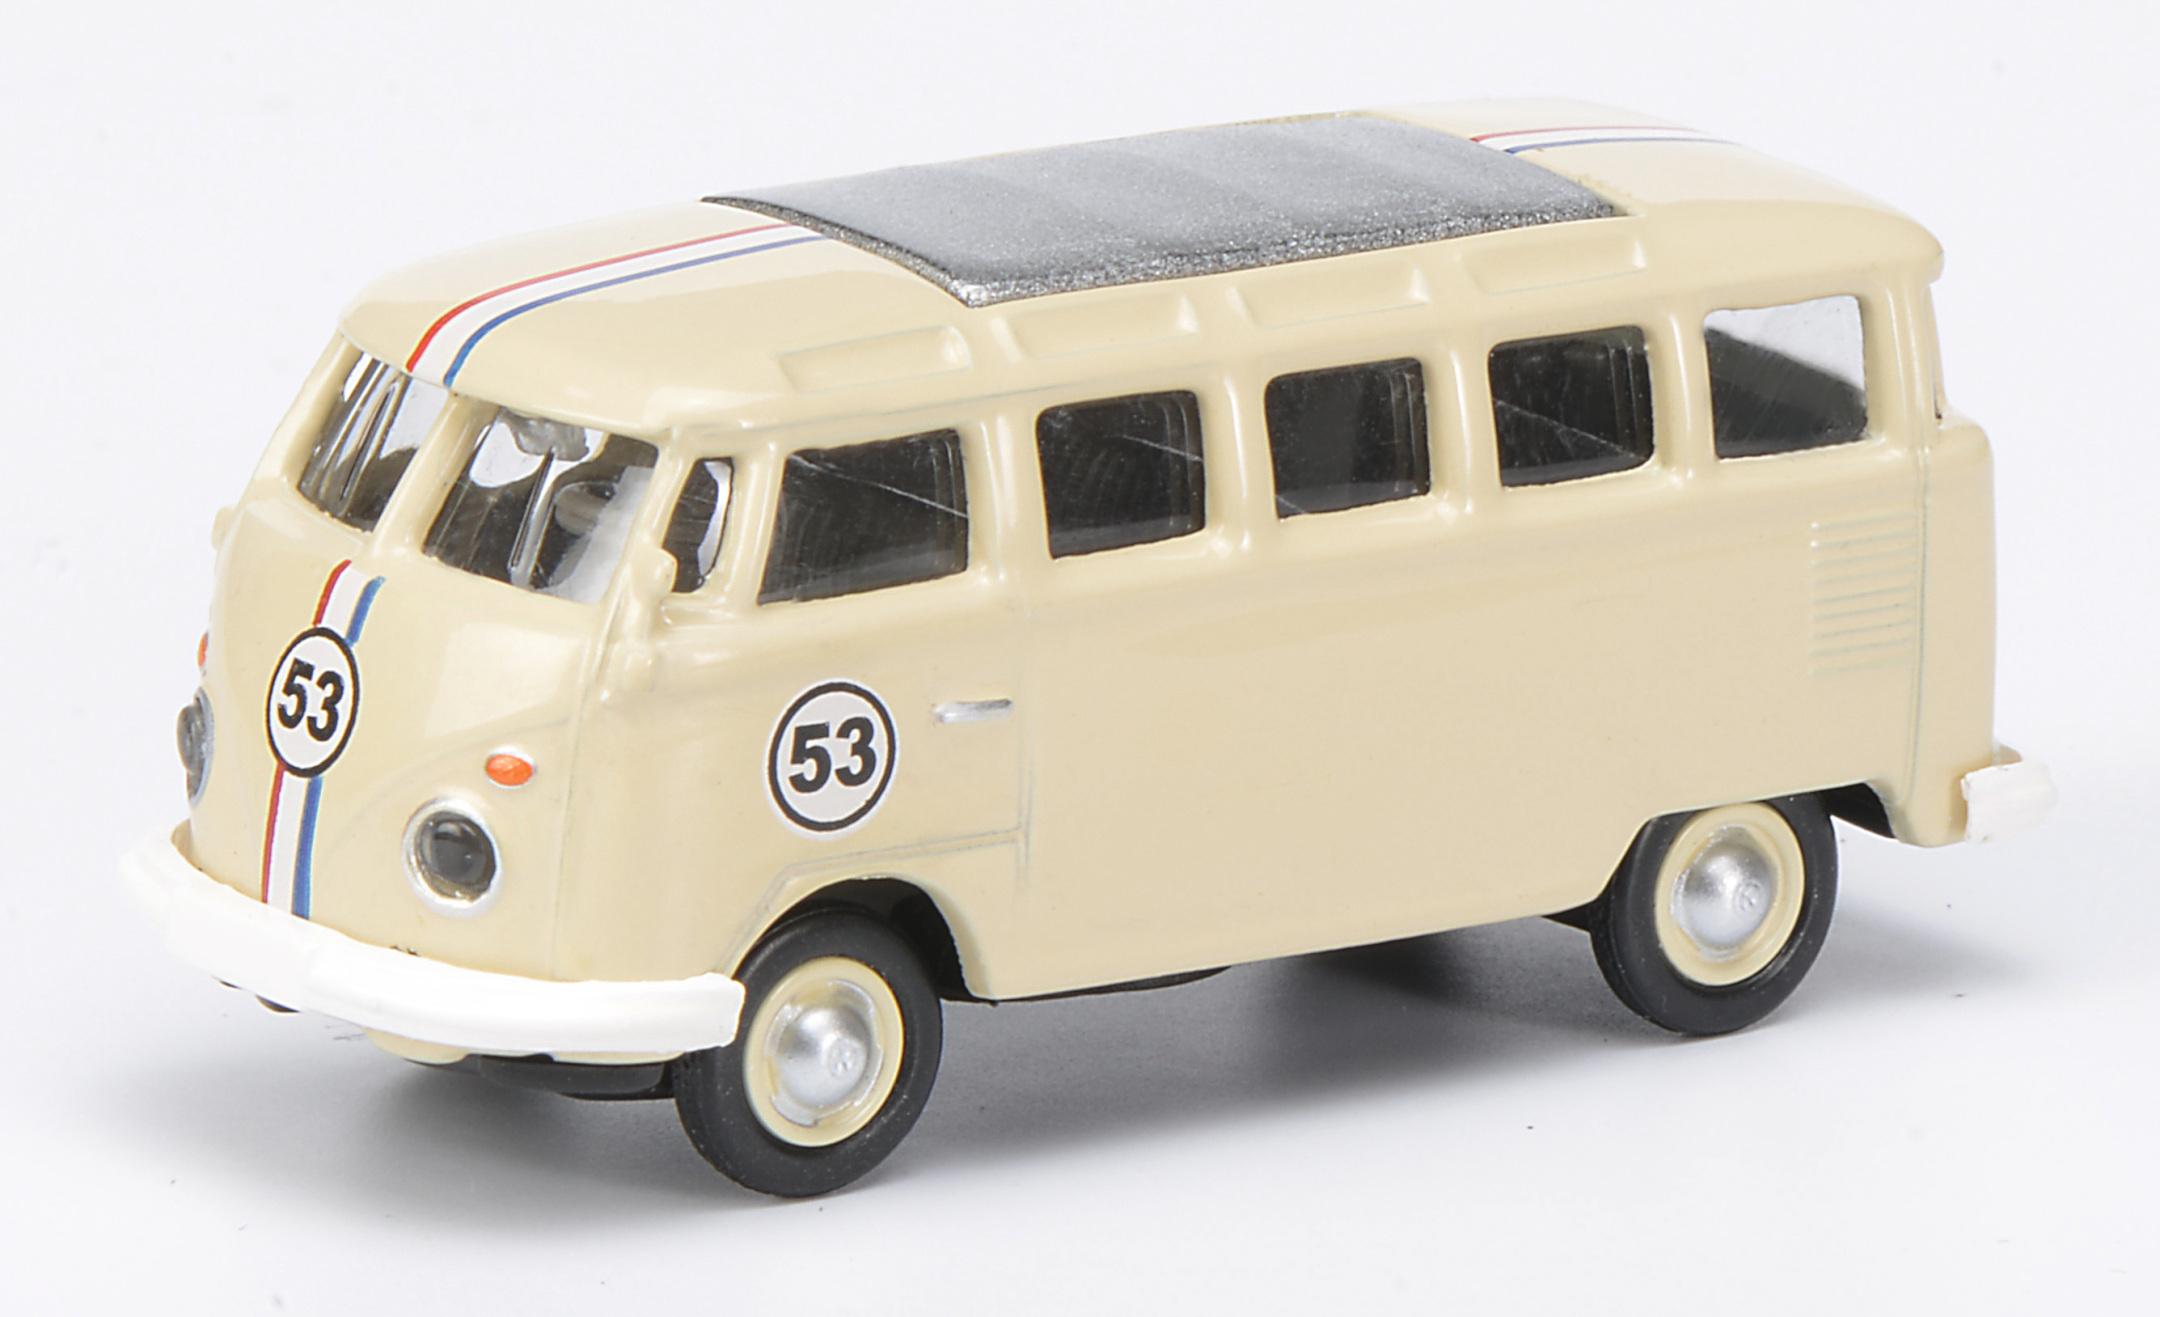 VW T1c Samba - Rallye #53